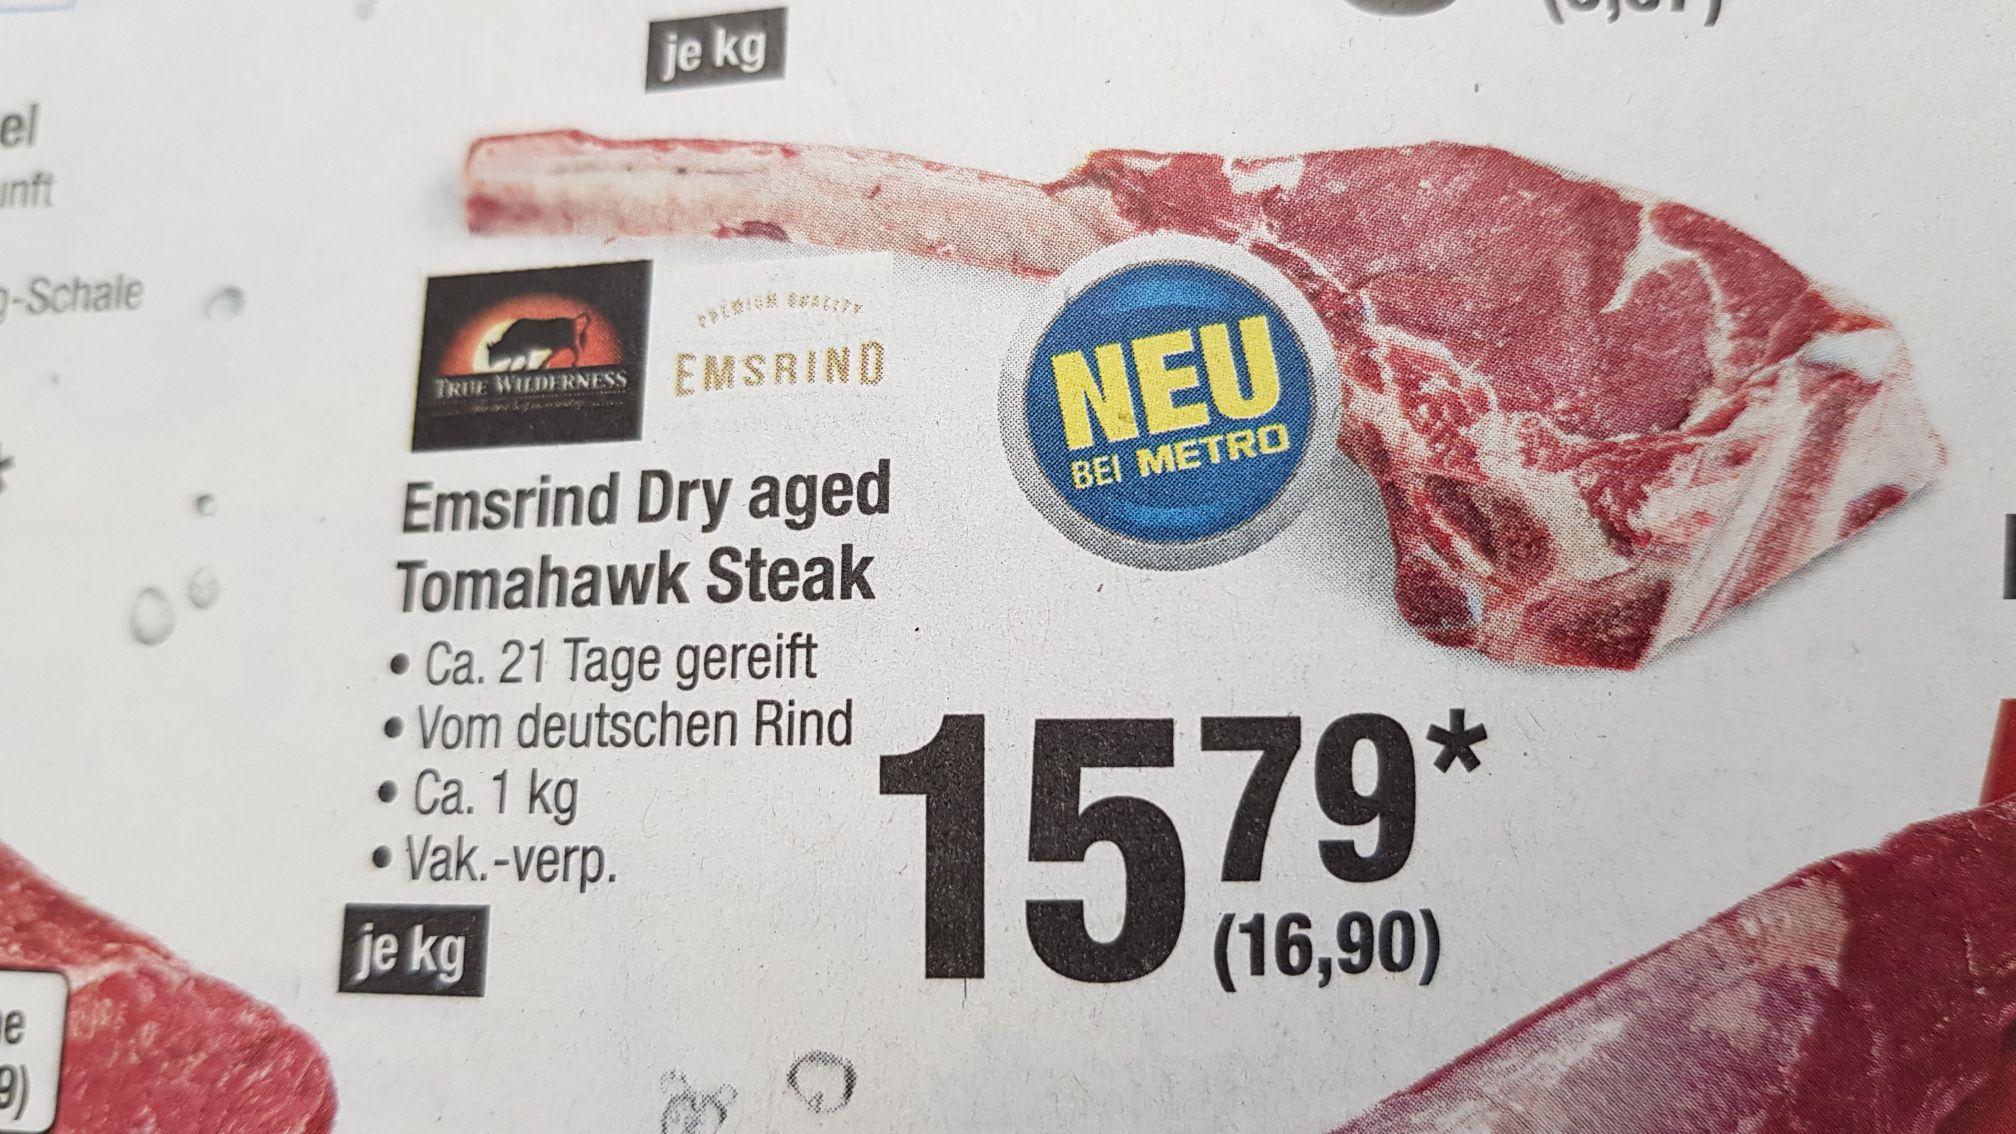 Tomahawk dry aged Metro zum Bestpreis (16,90 Euro /kg})